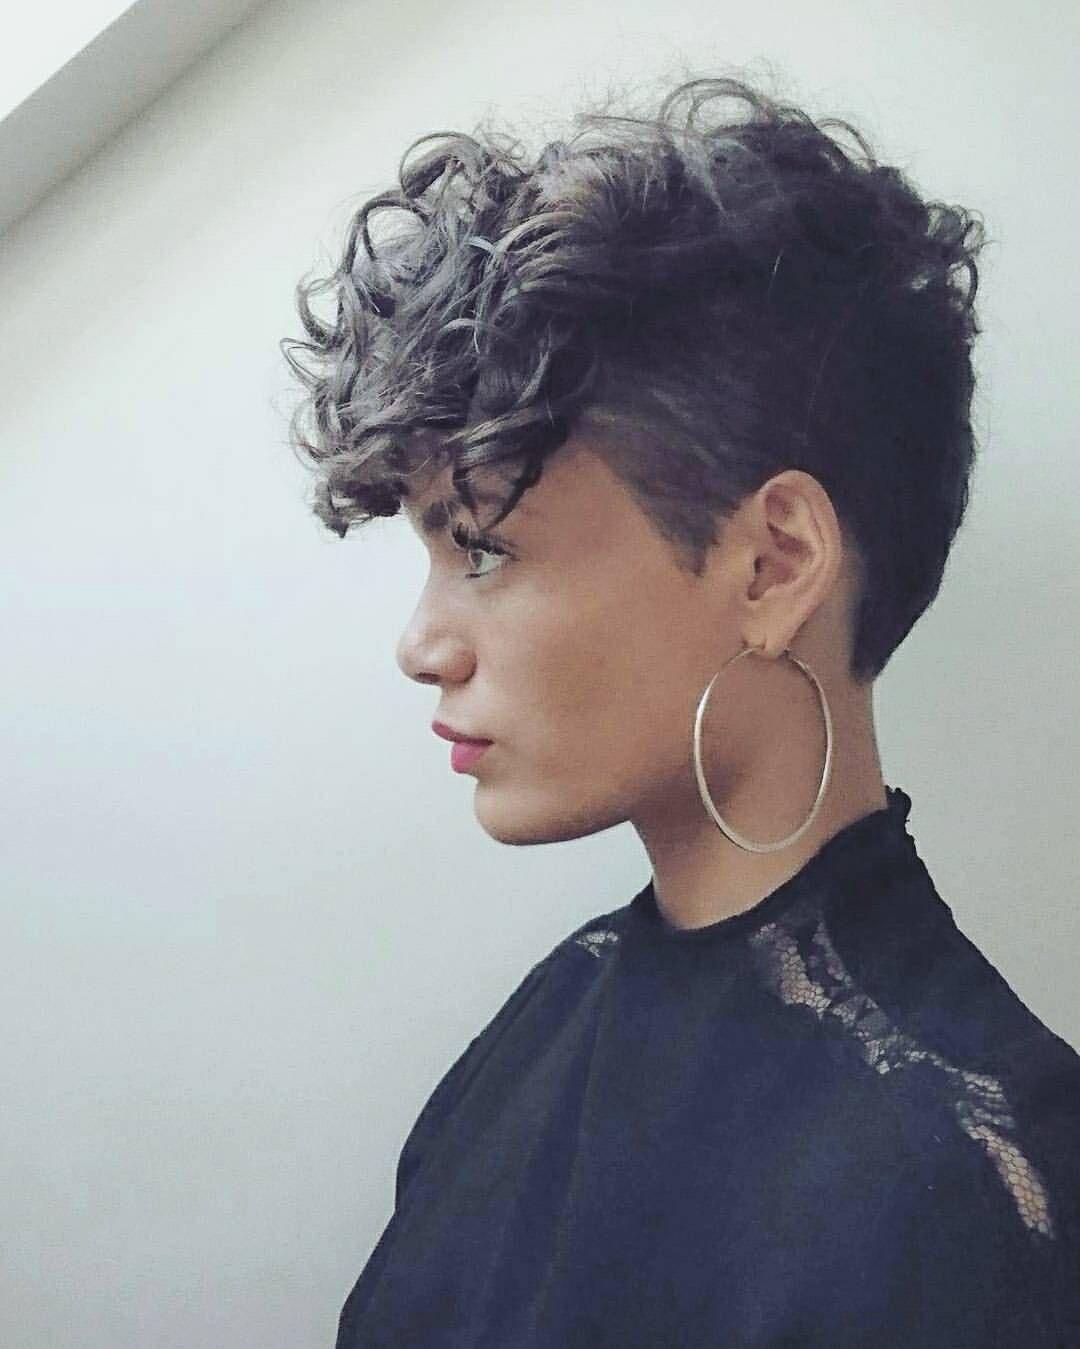 Florelle Plaisance on Instagram ucCut  u  Hairstyle  Pinterest